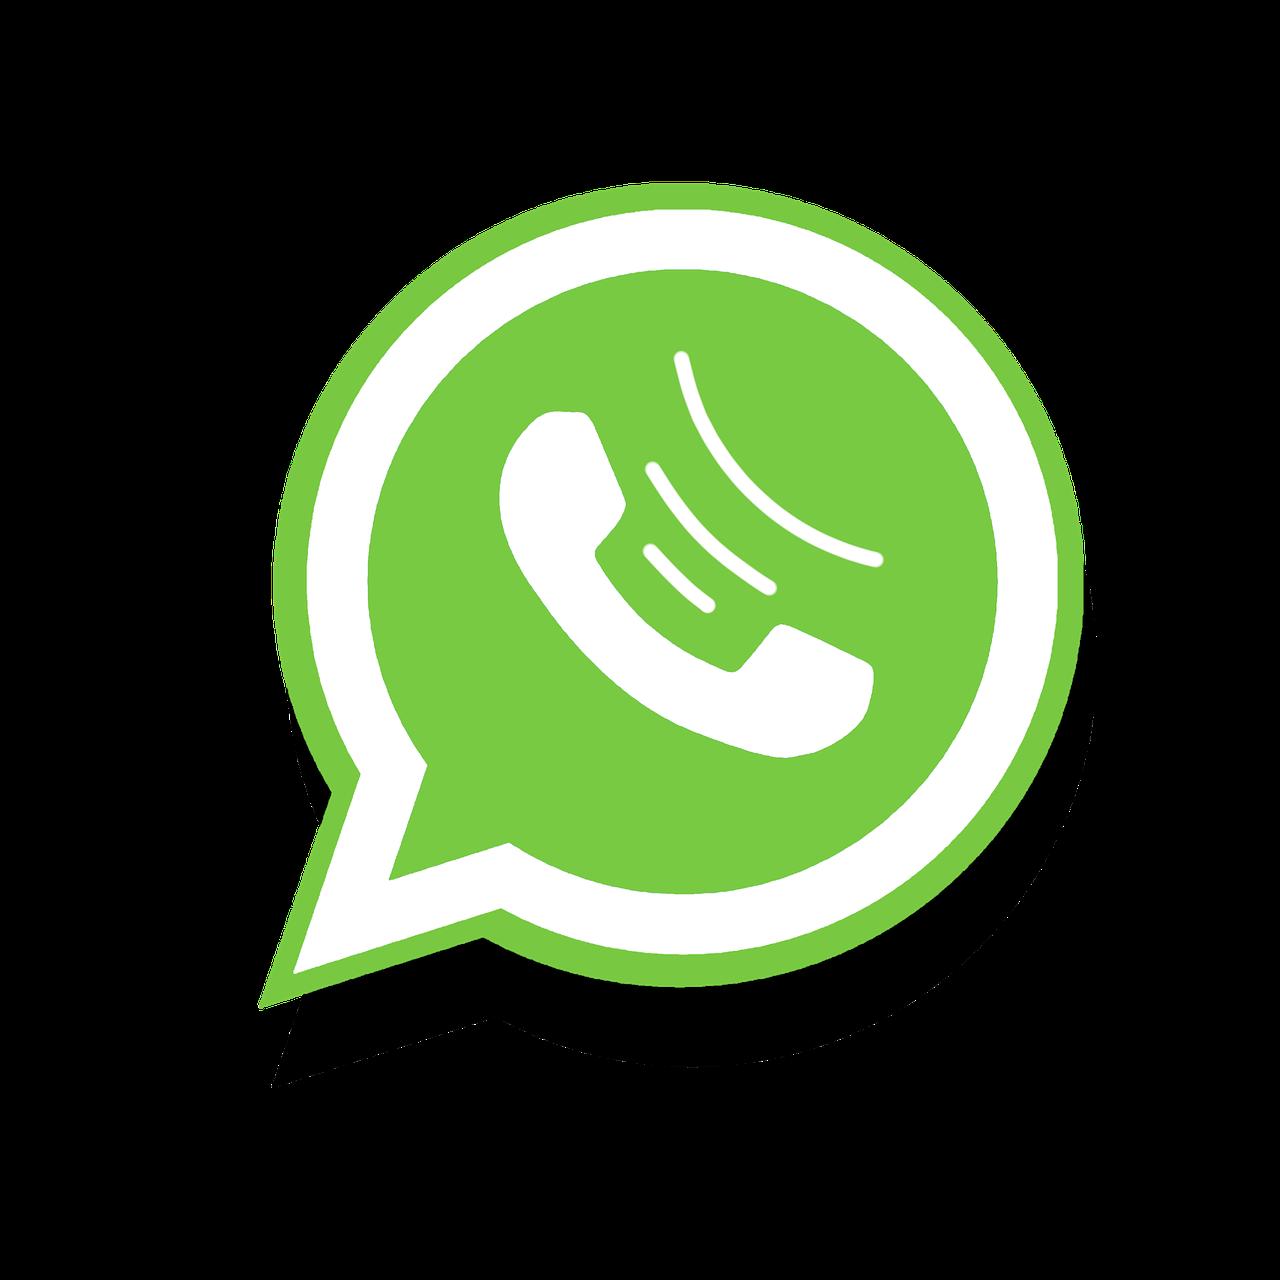 Whatsapp,icon,communication,social,sms - free photo from needpix com